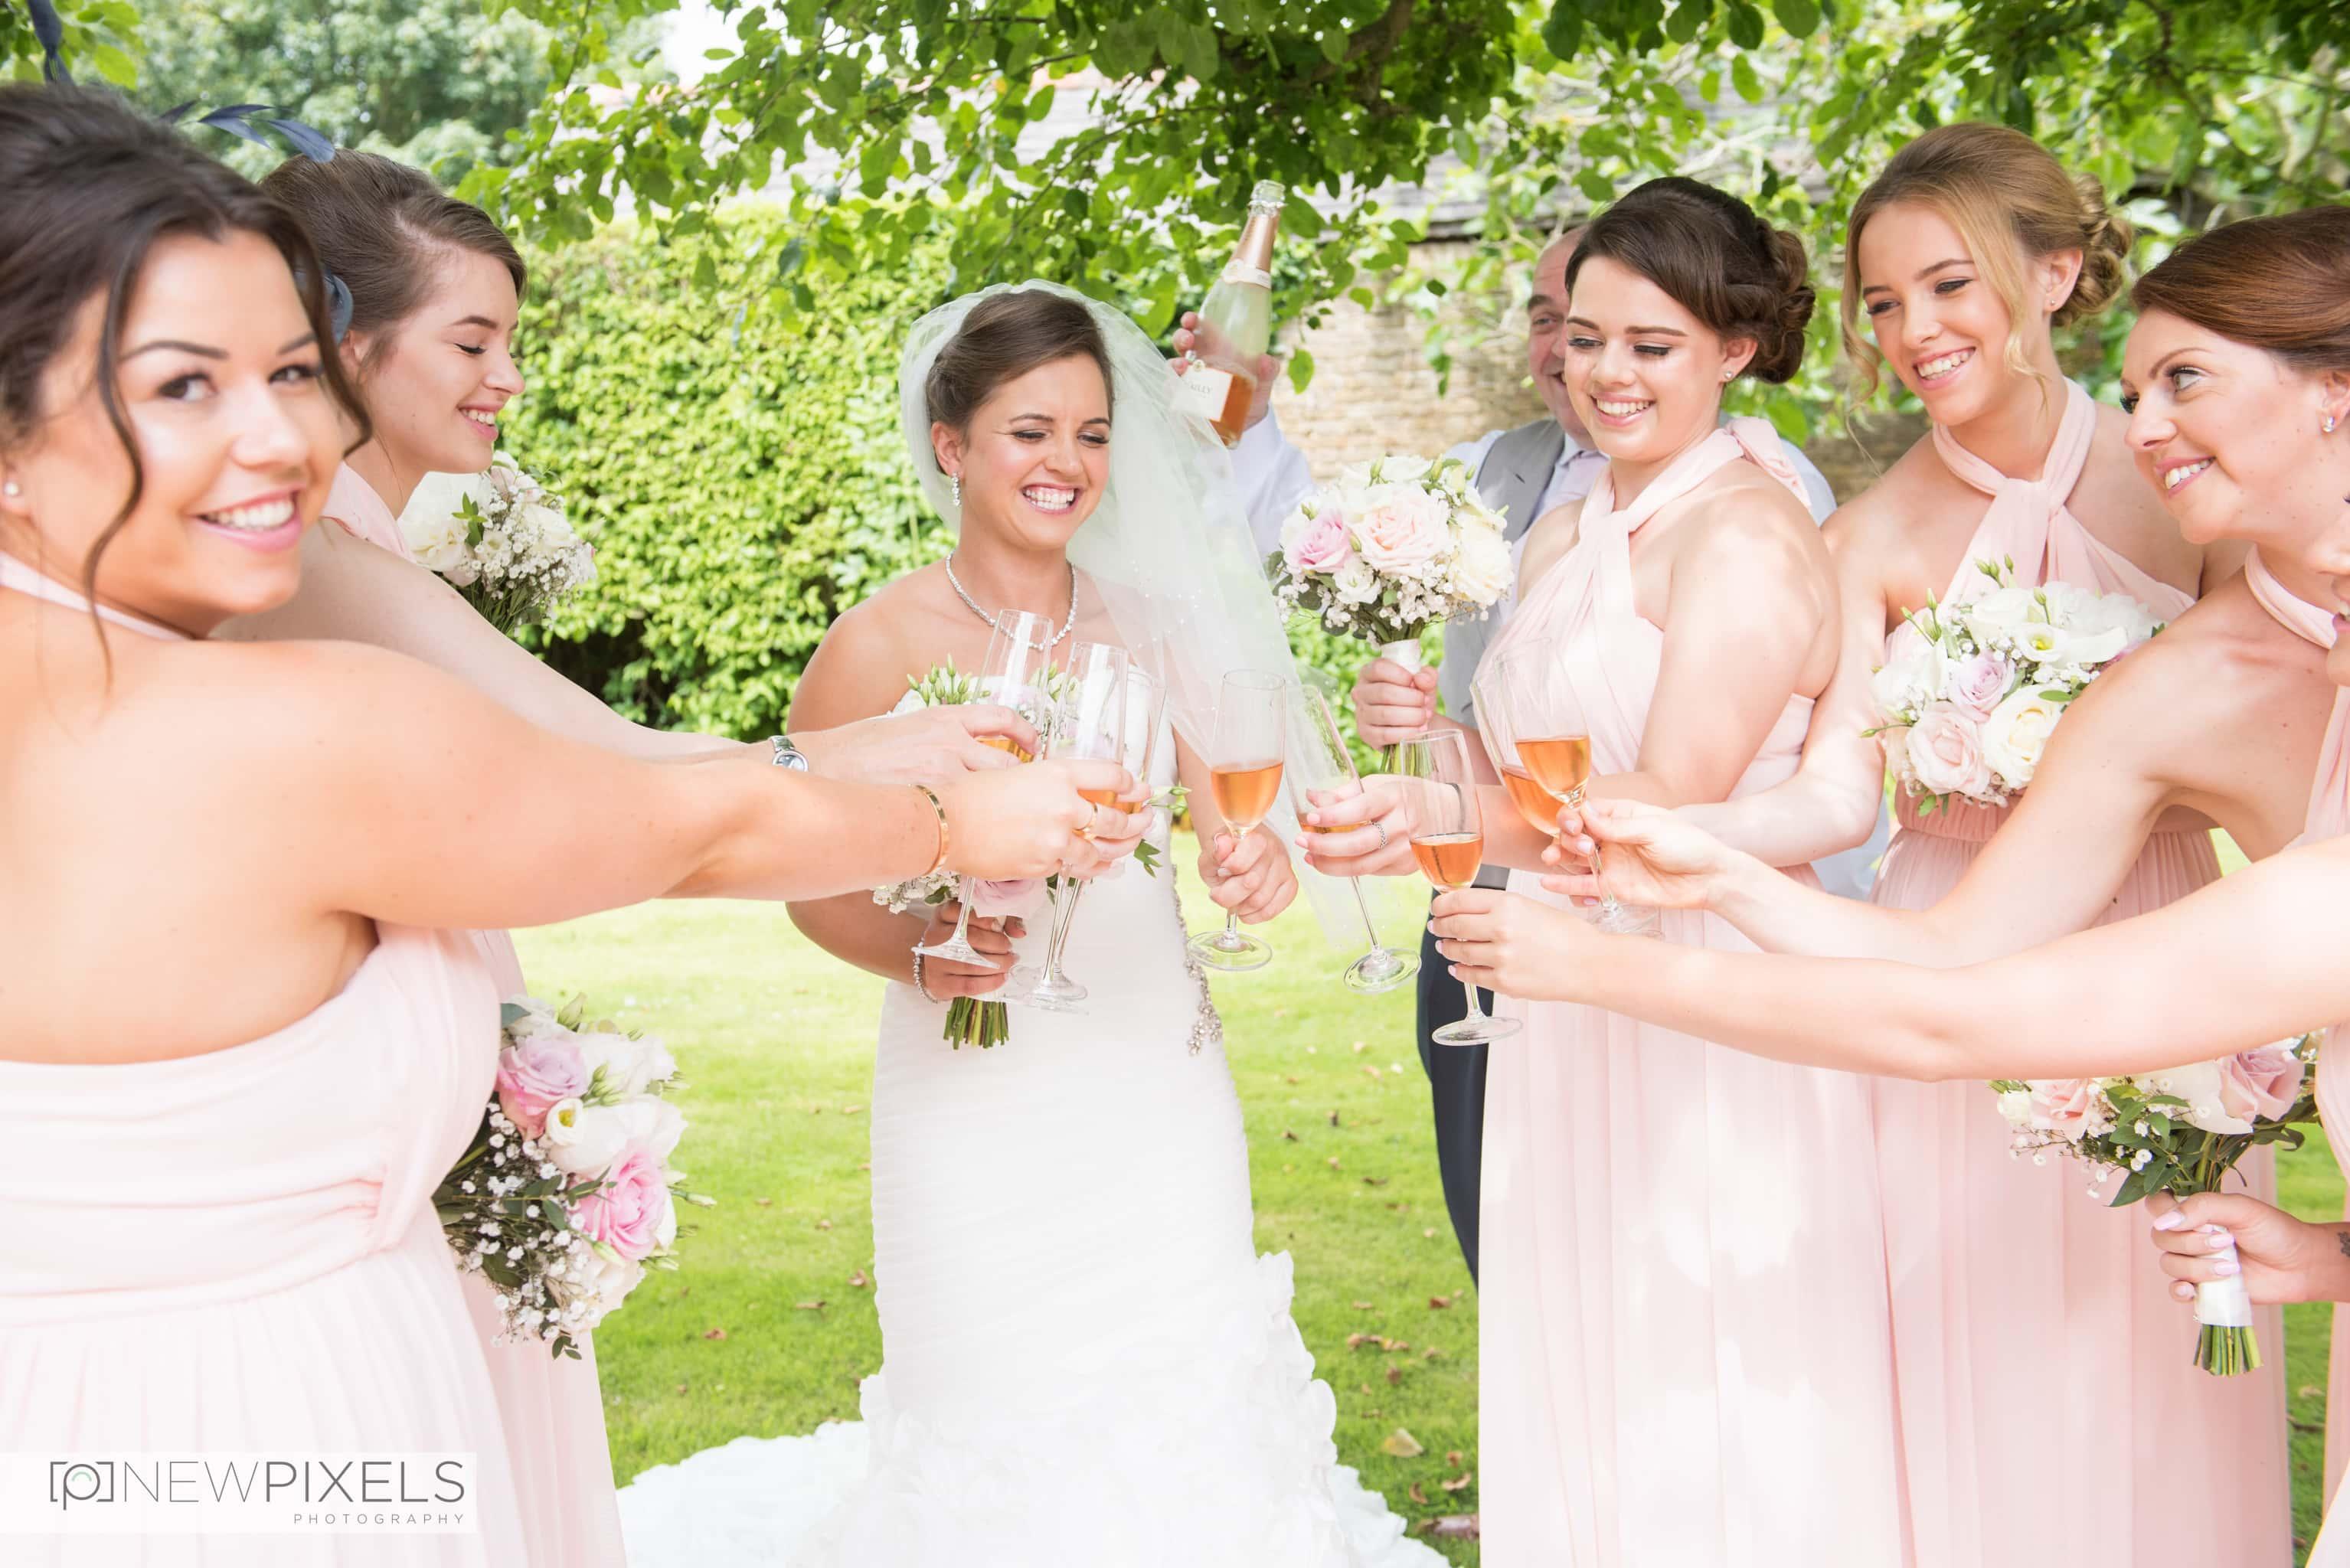 Wedding Photography Matching Green-13